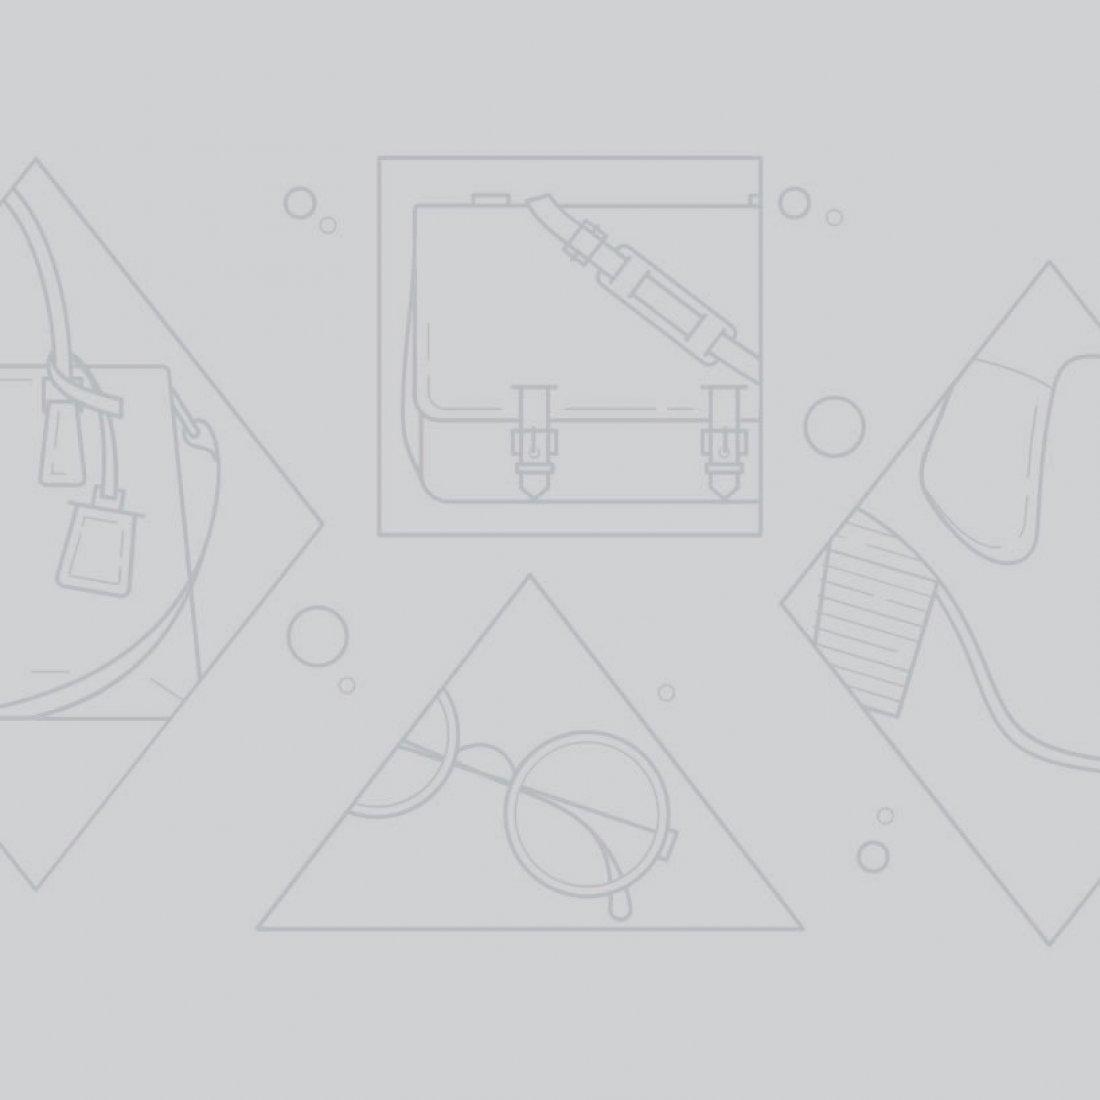 Магнит Символ 2020 Крыса 6, оптом фото 1